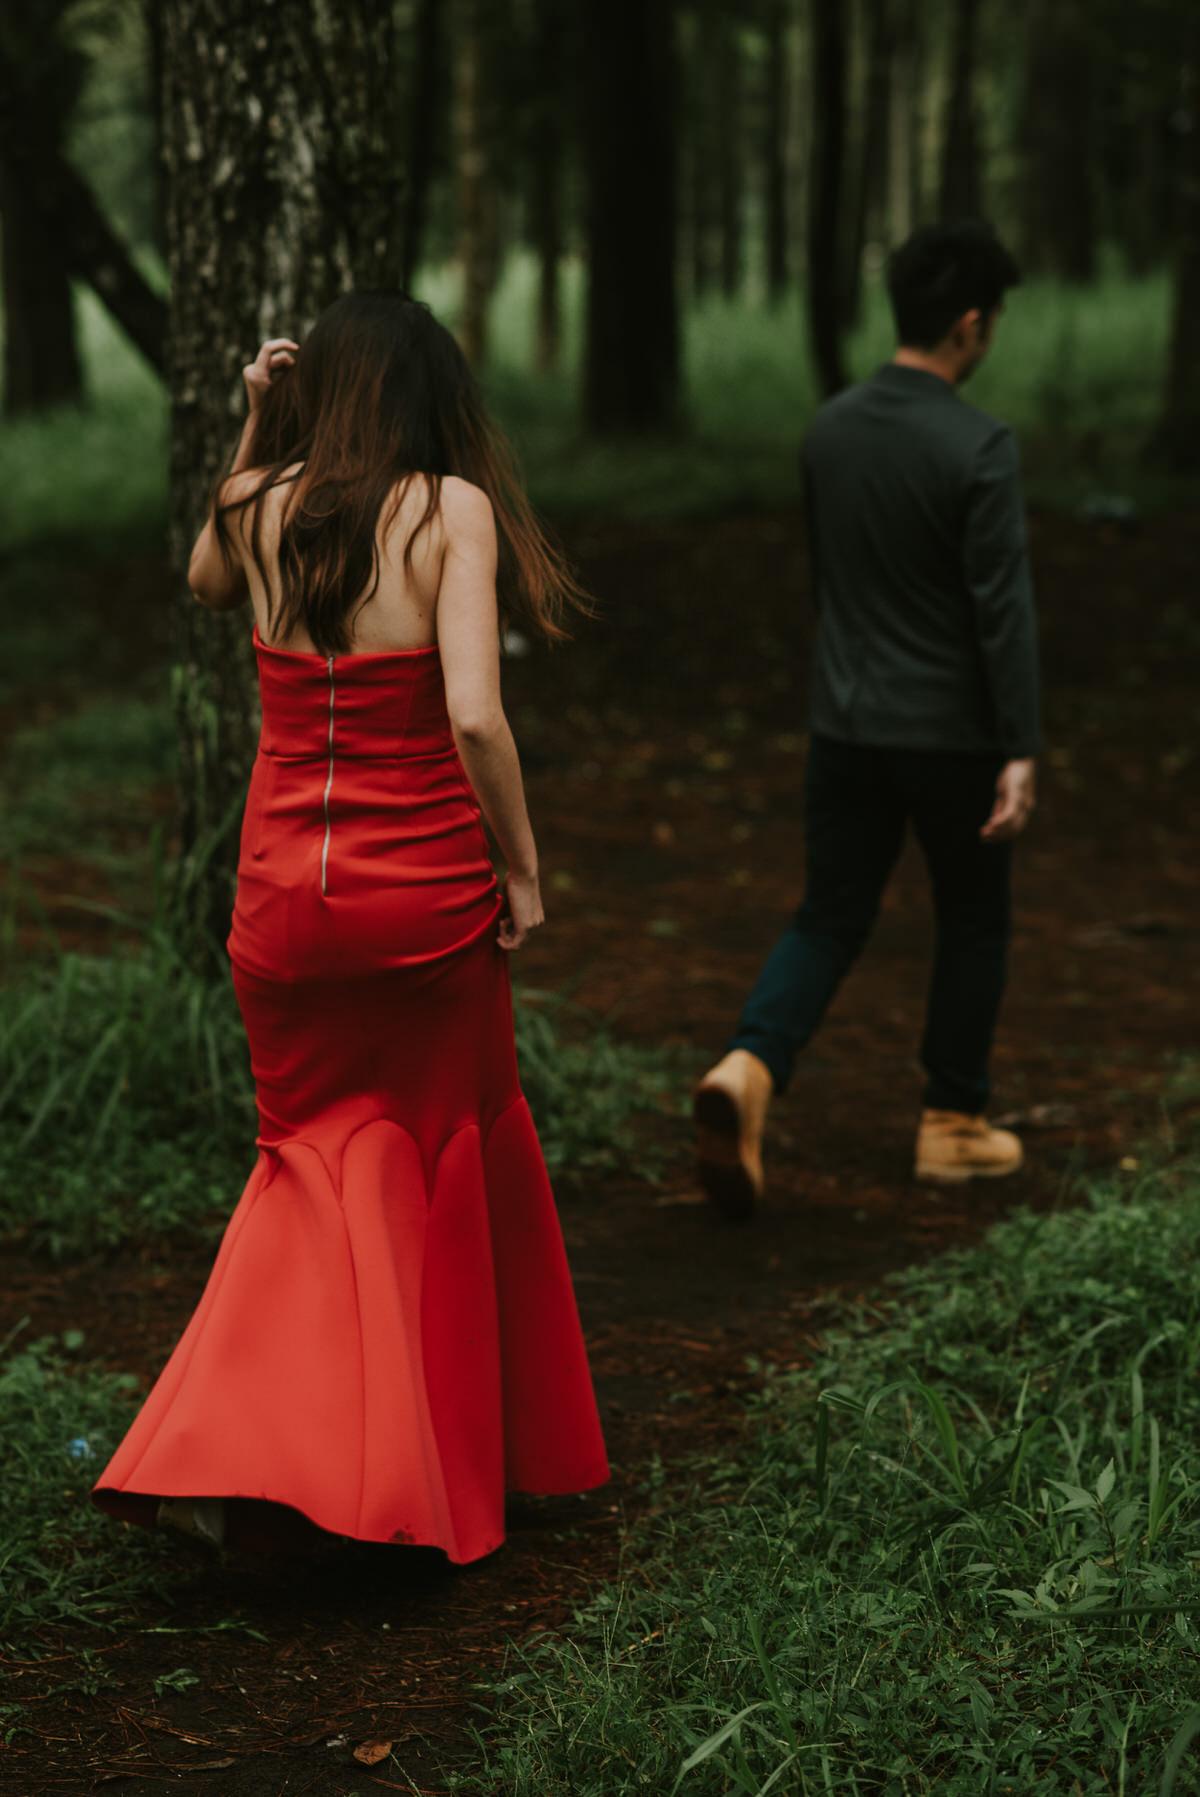 bali engagement destination-prewedding in bali - bali photographer - lake tamblingan - mount batur - profesional bali wedding photographer - diktatphotography - H&Z prewedding - 45